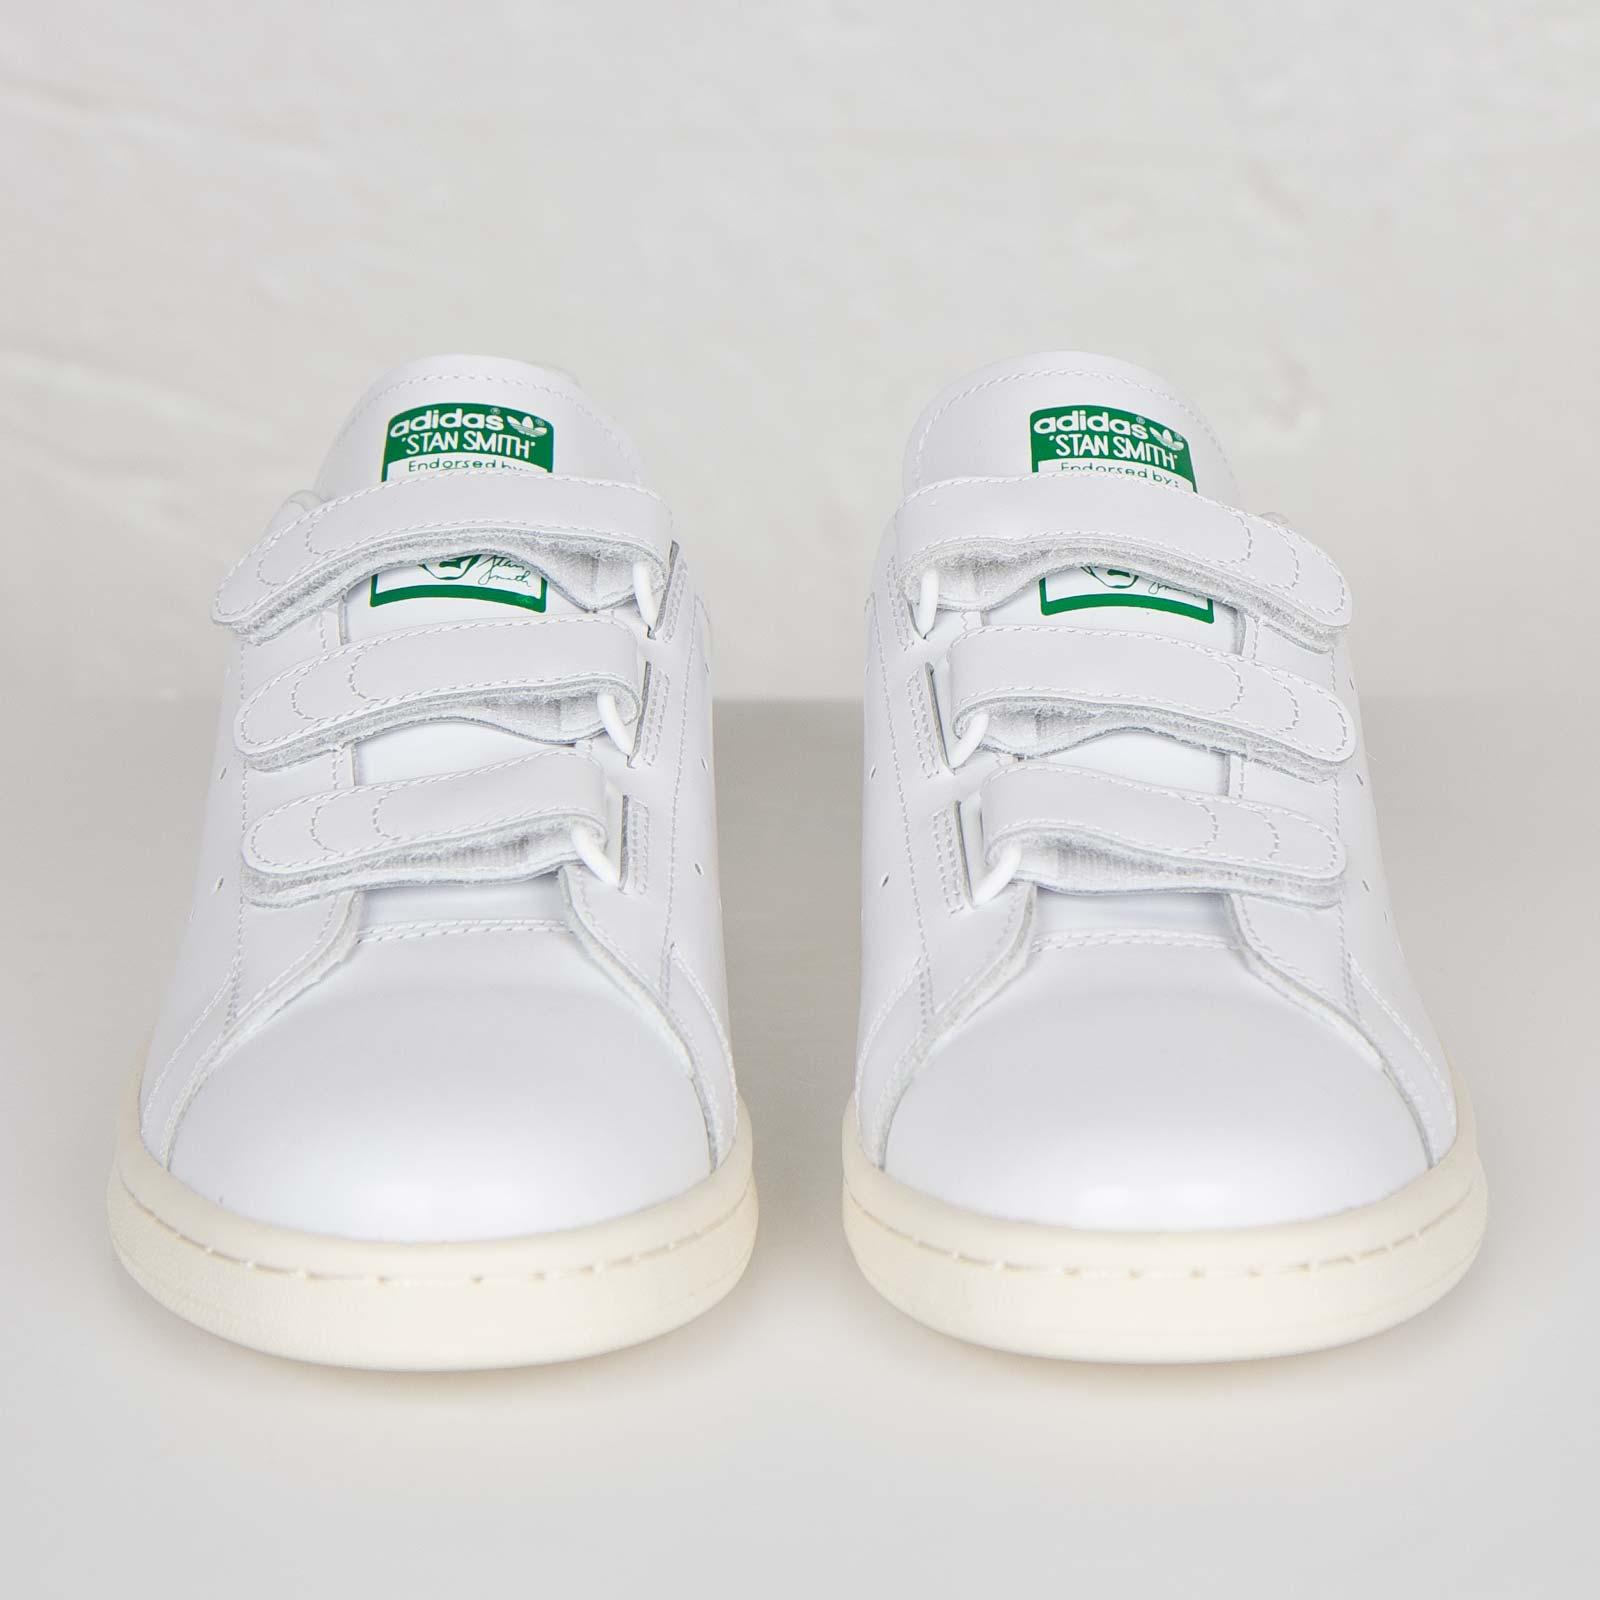 premium selection 37658 97c63 adidas Stan Smith CF Nigo - B26000 - Sneakersnstuff ...